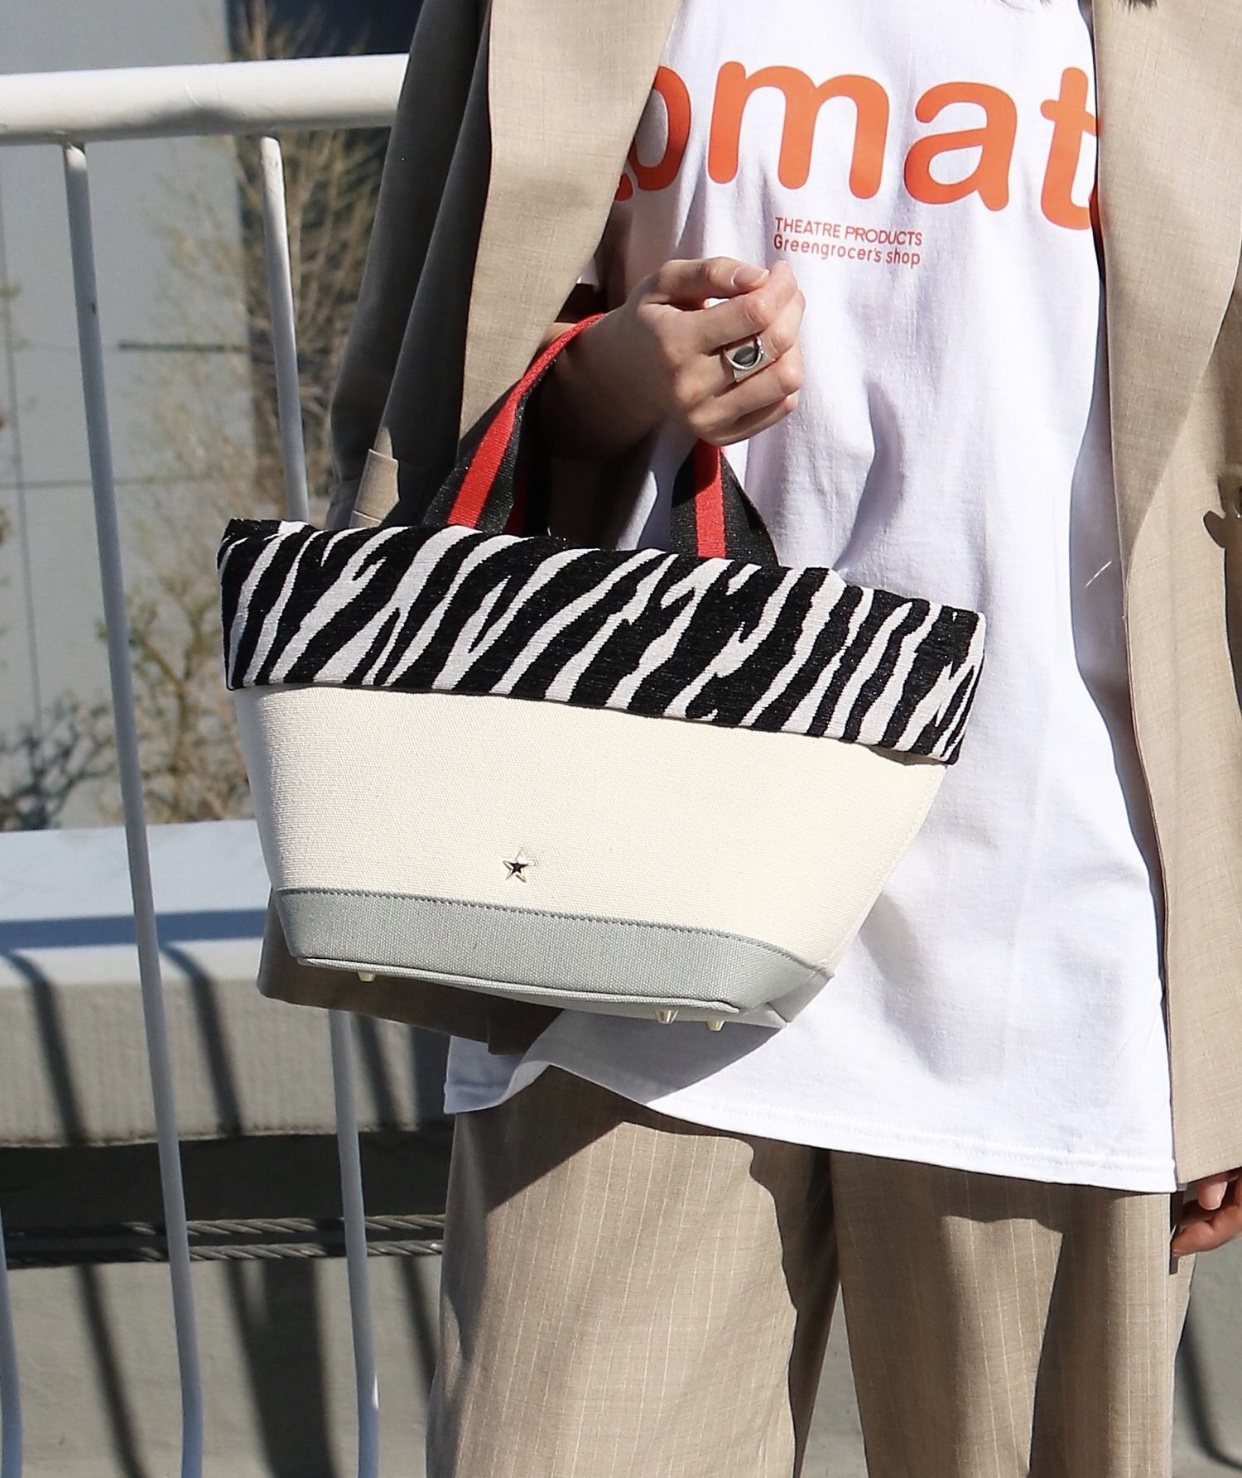 Scrap Book atneK スクラップブック アトネック キャンバスバッグ ゼブラ柄 星スタッズ ストライプ 底鋲付き トートバッグ ハンドルバッグ 日本ブランド カジュアルスタイル